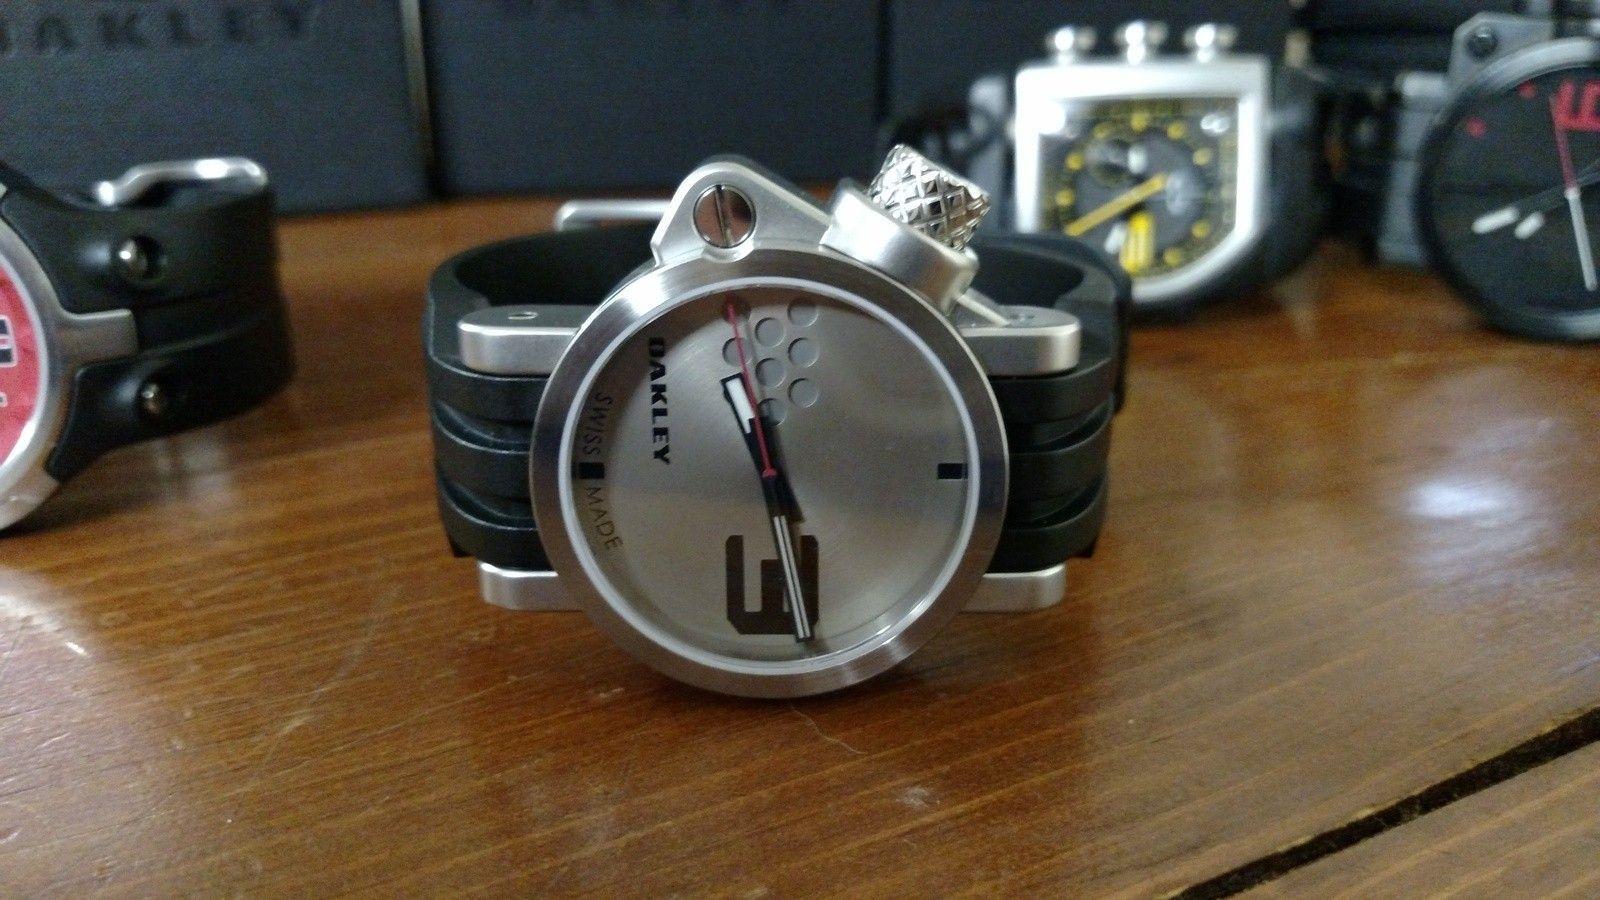 Lot of watches (cheap) - uploadfromtaptalk1446851962785.jpg